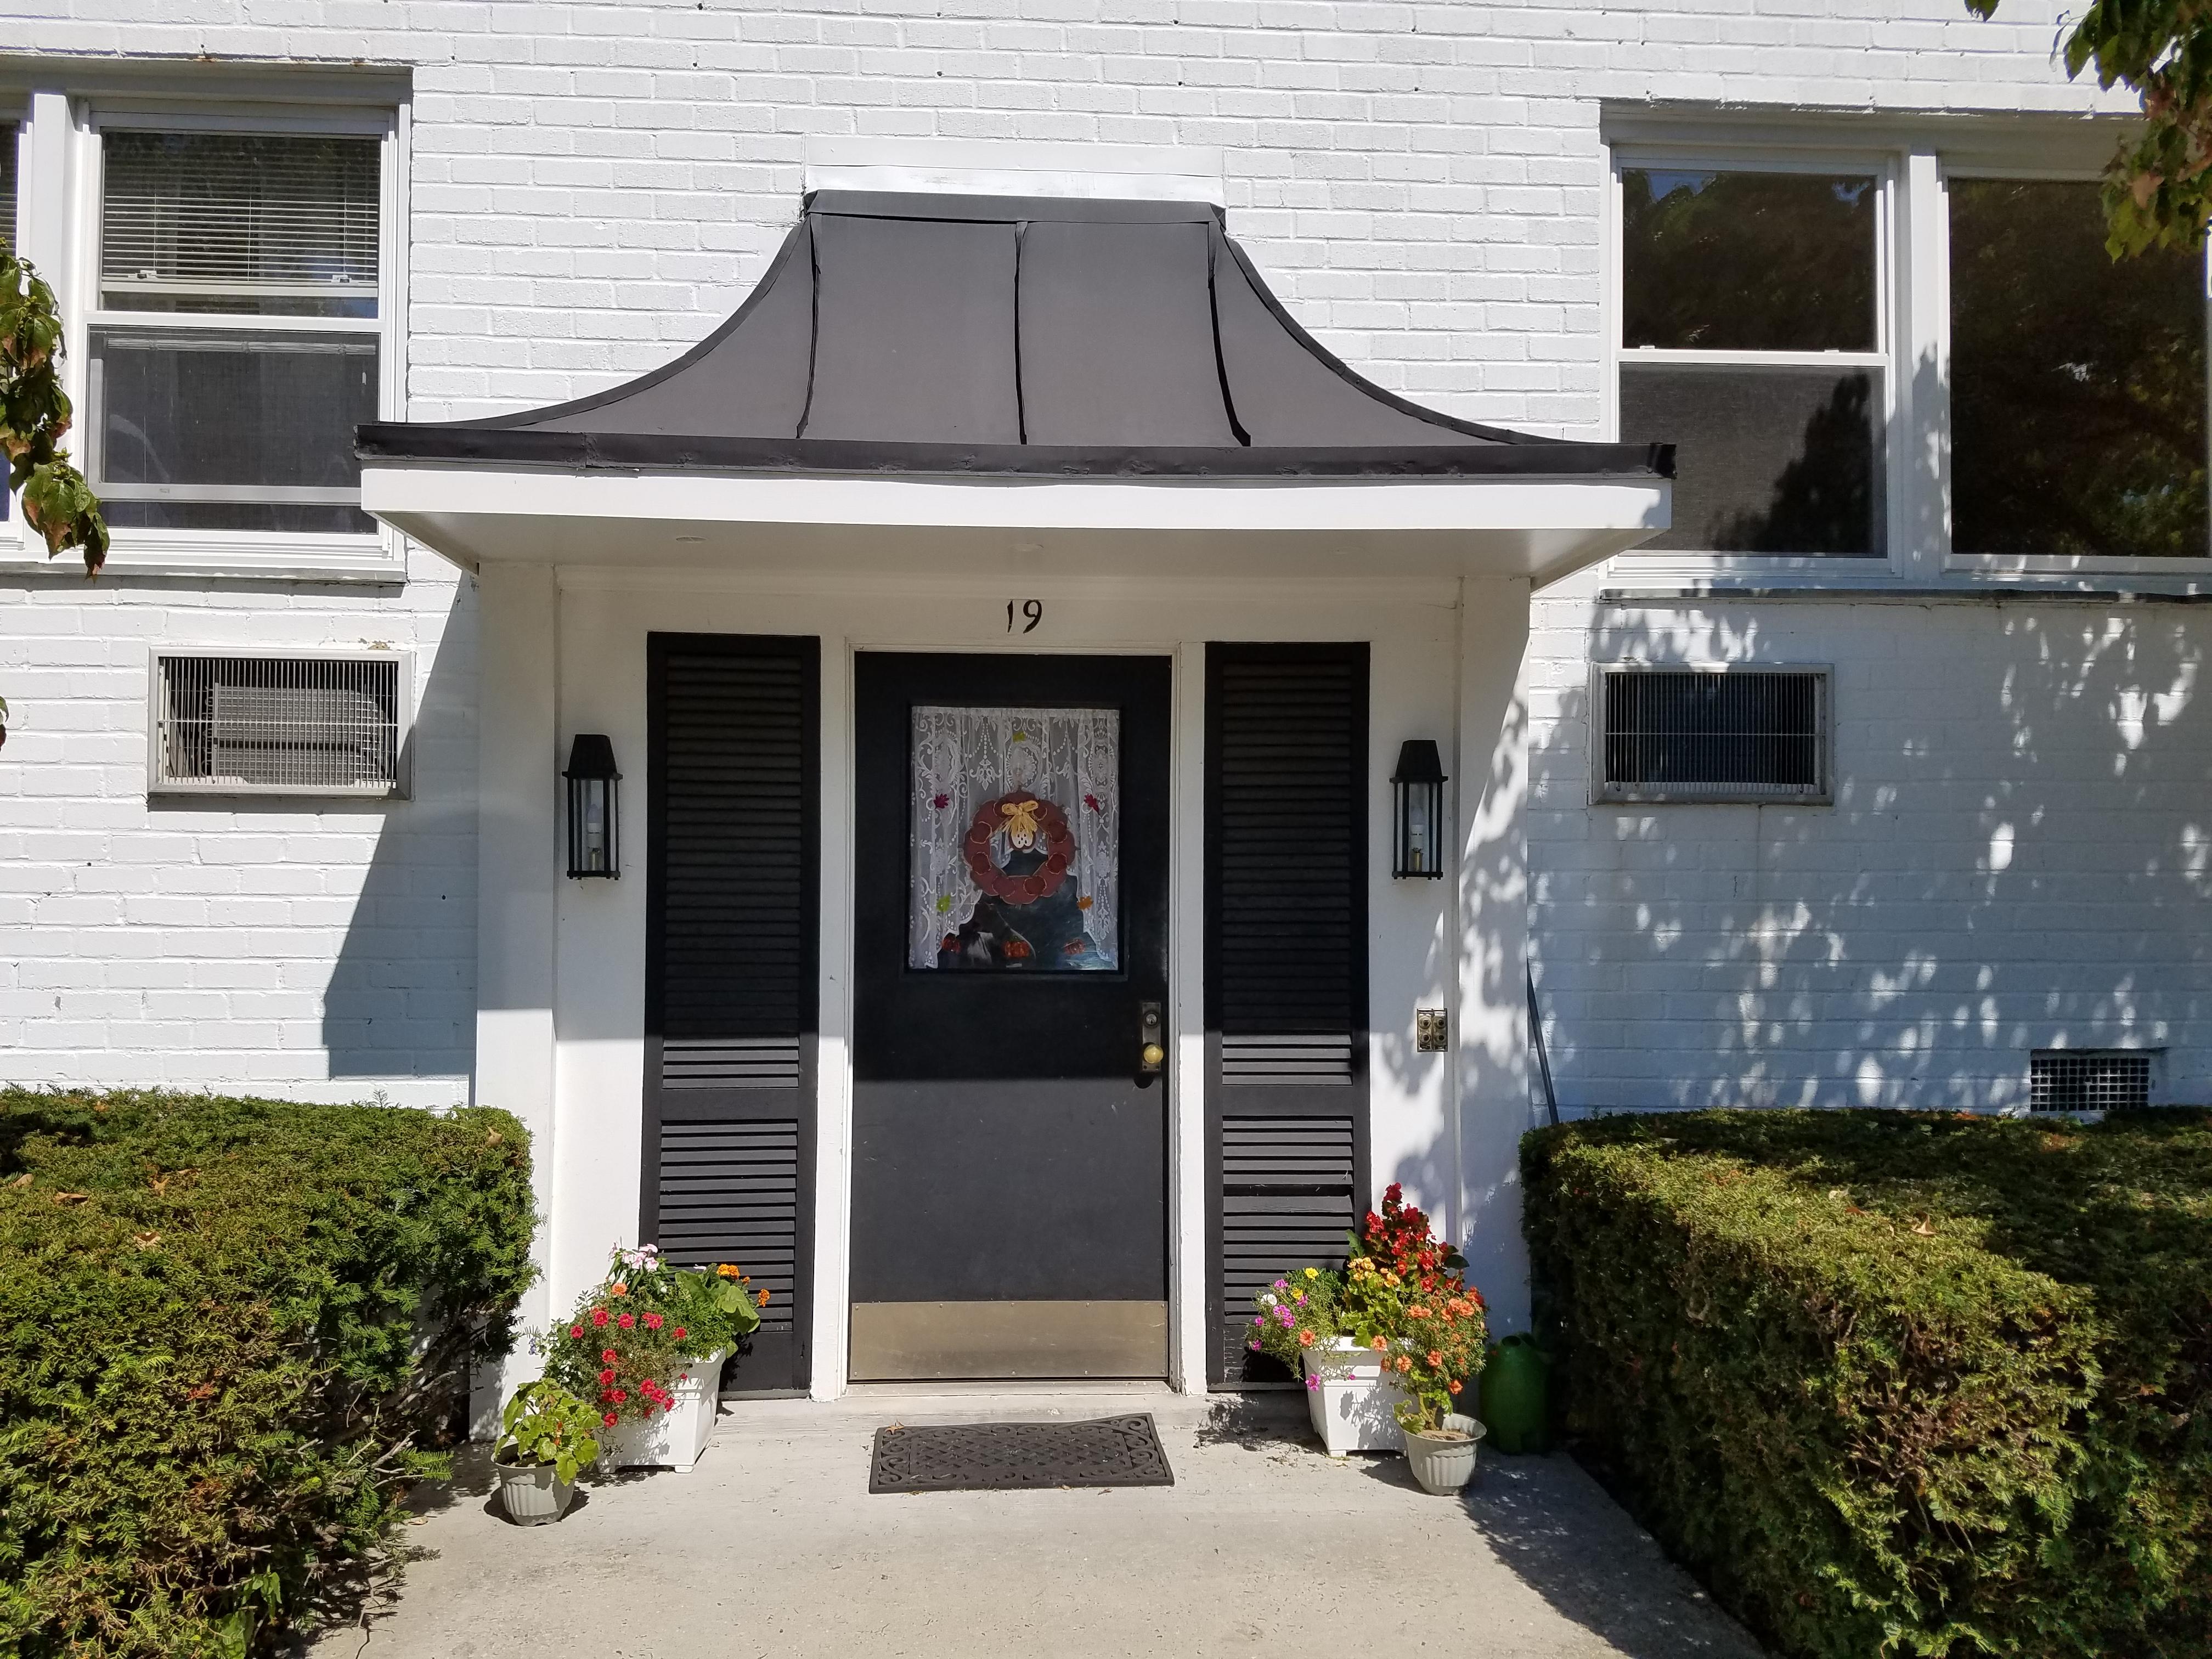 Condominium for Sale at 19 Avon Circle 19 Avon Circle B Rye Brook, New York, 10573 United States